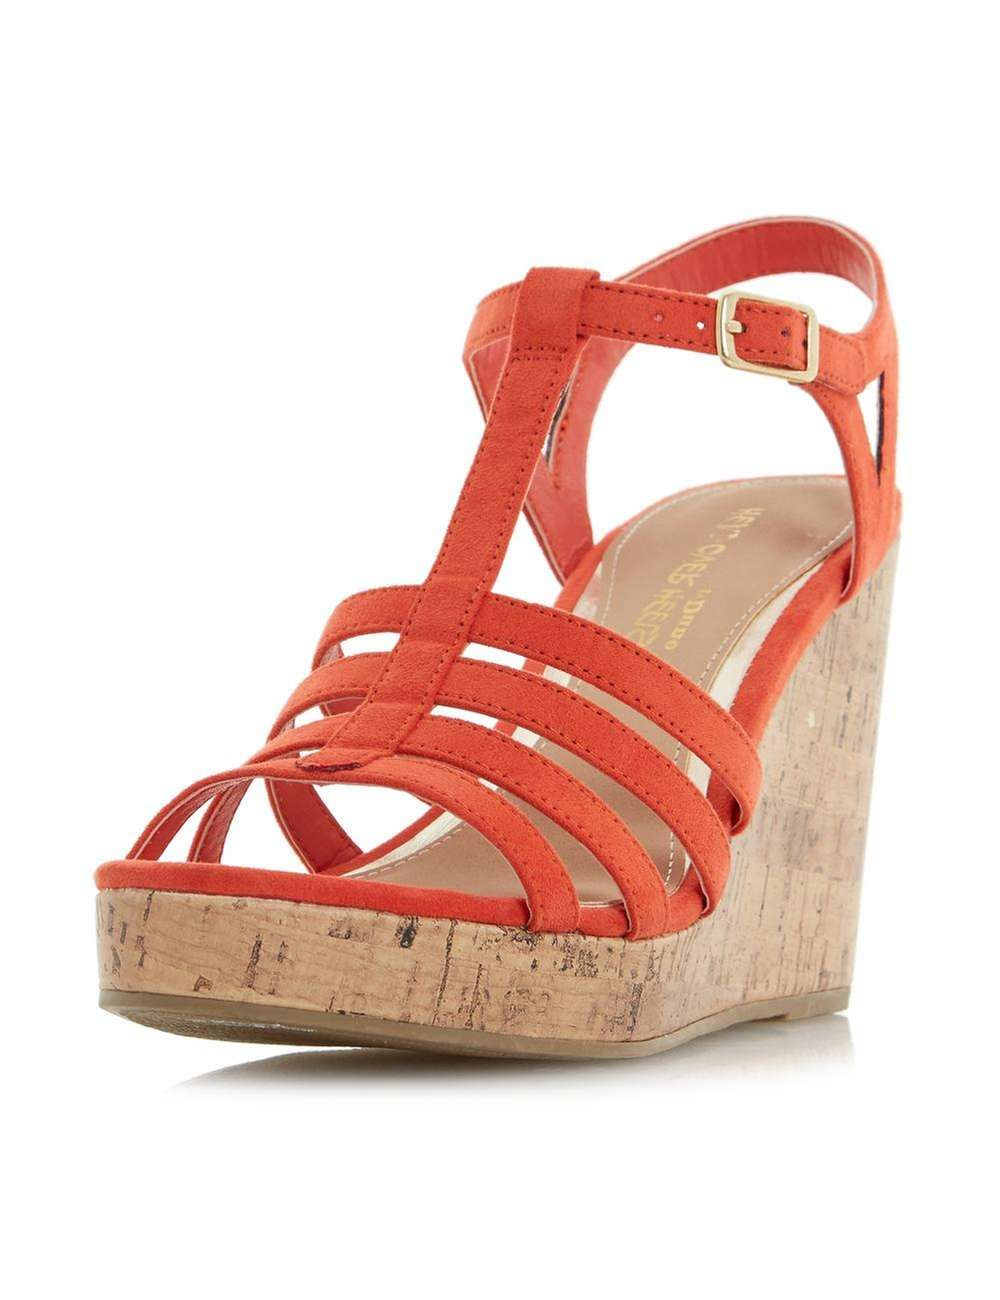 Dune Orange 'Keeli' Wedge Sandals